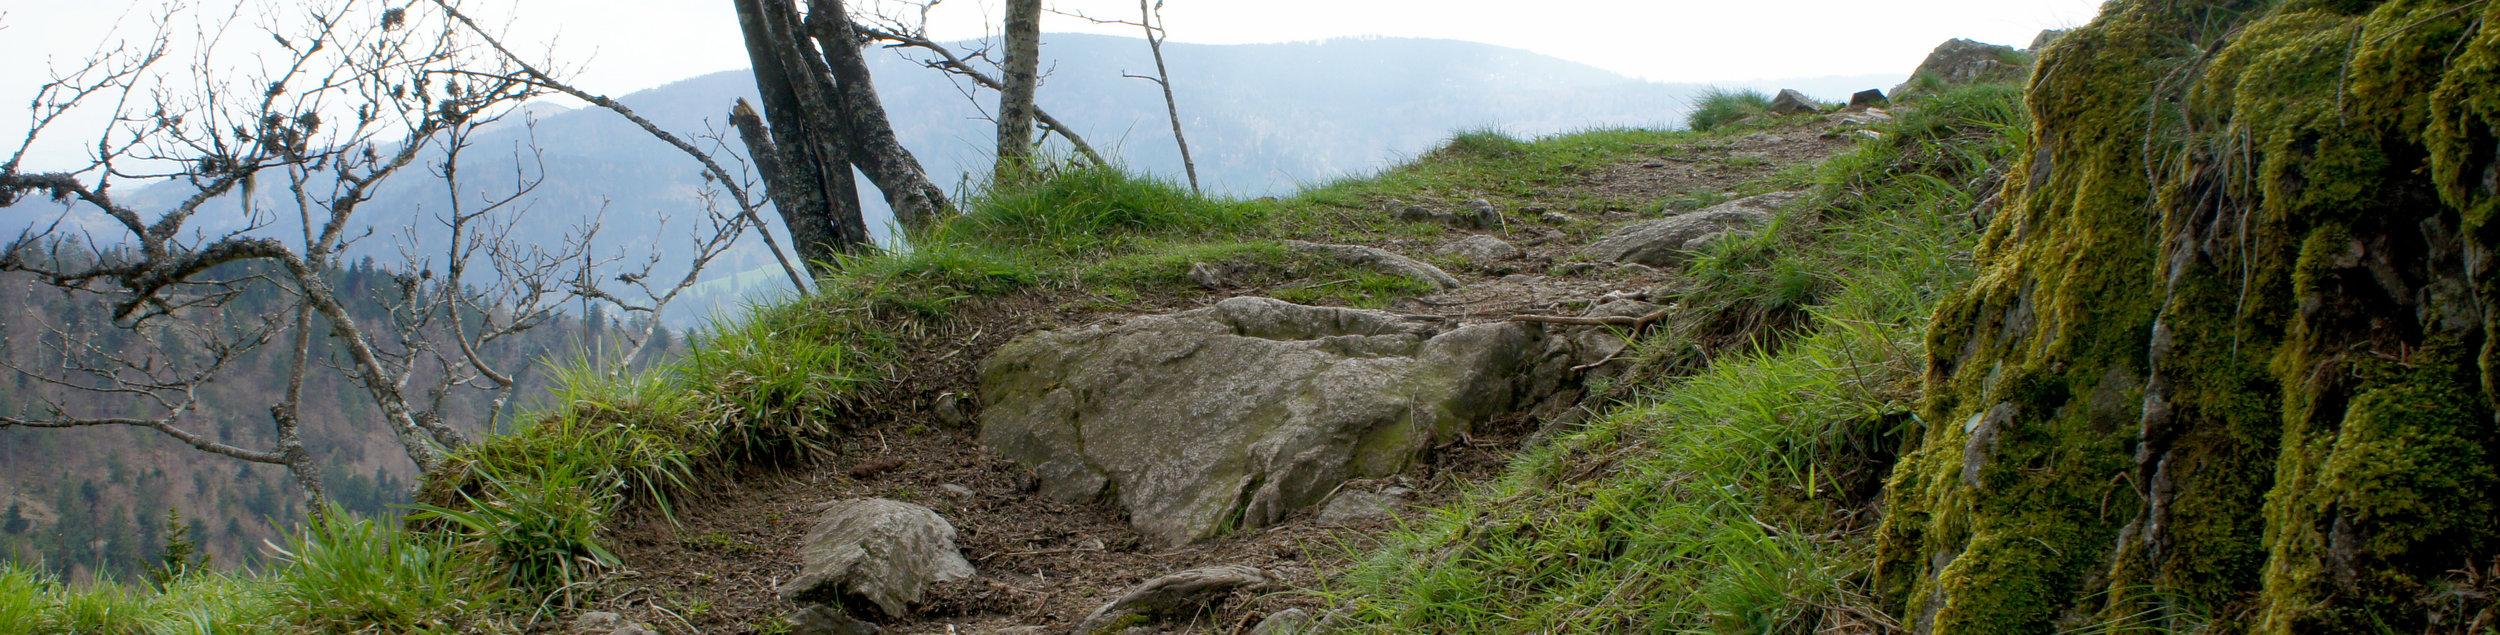 ABschluss der Wildnisführer Ausbildung als Zertifizierter Outdoor Guide